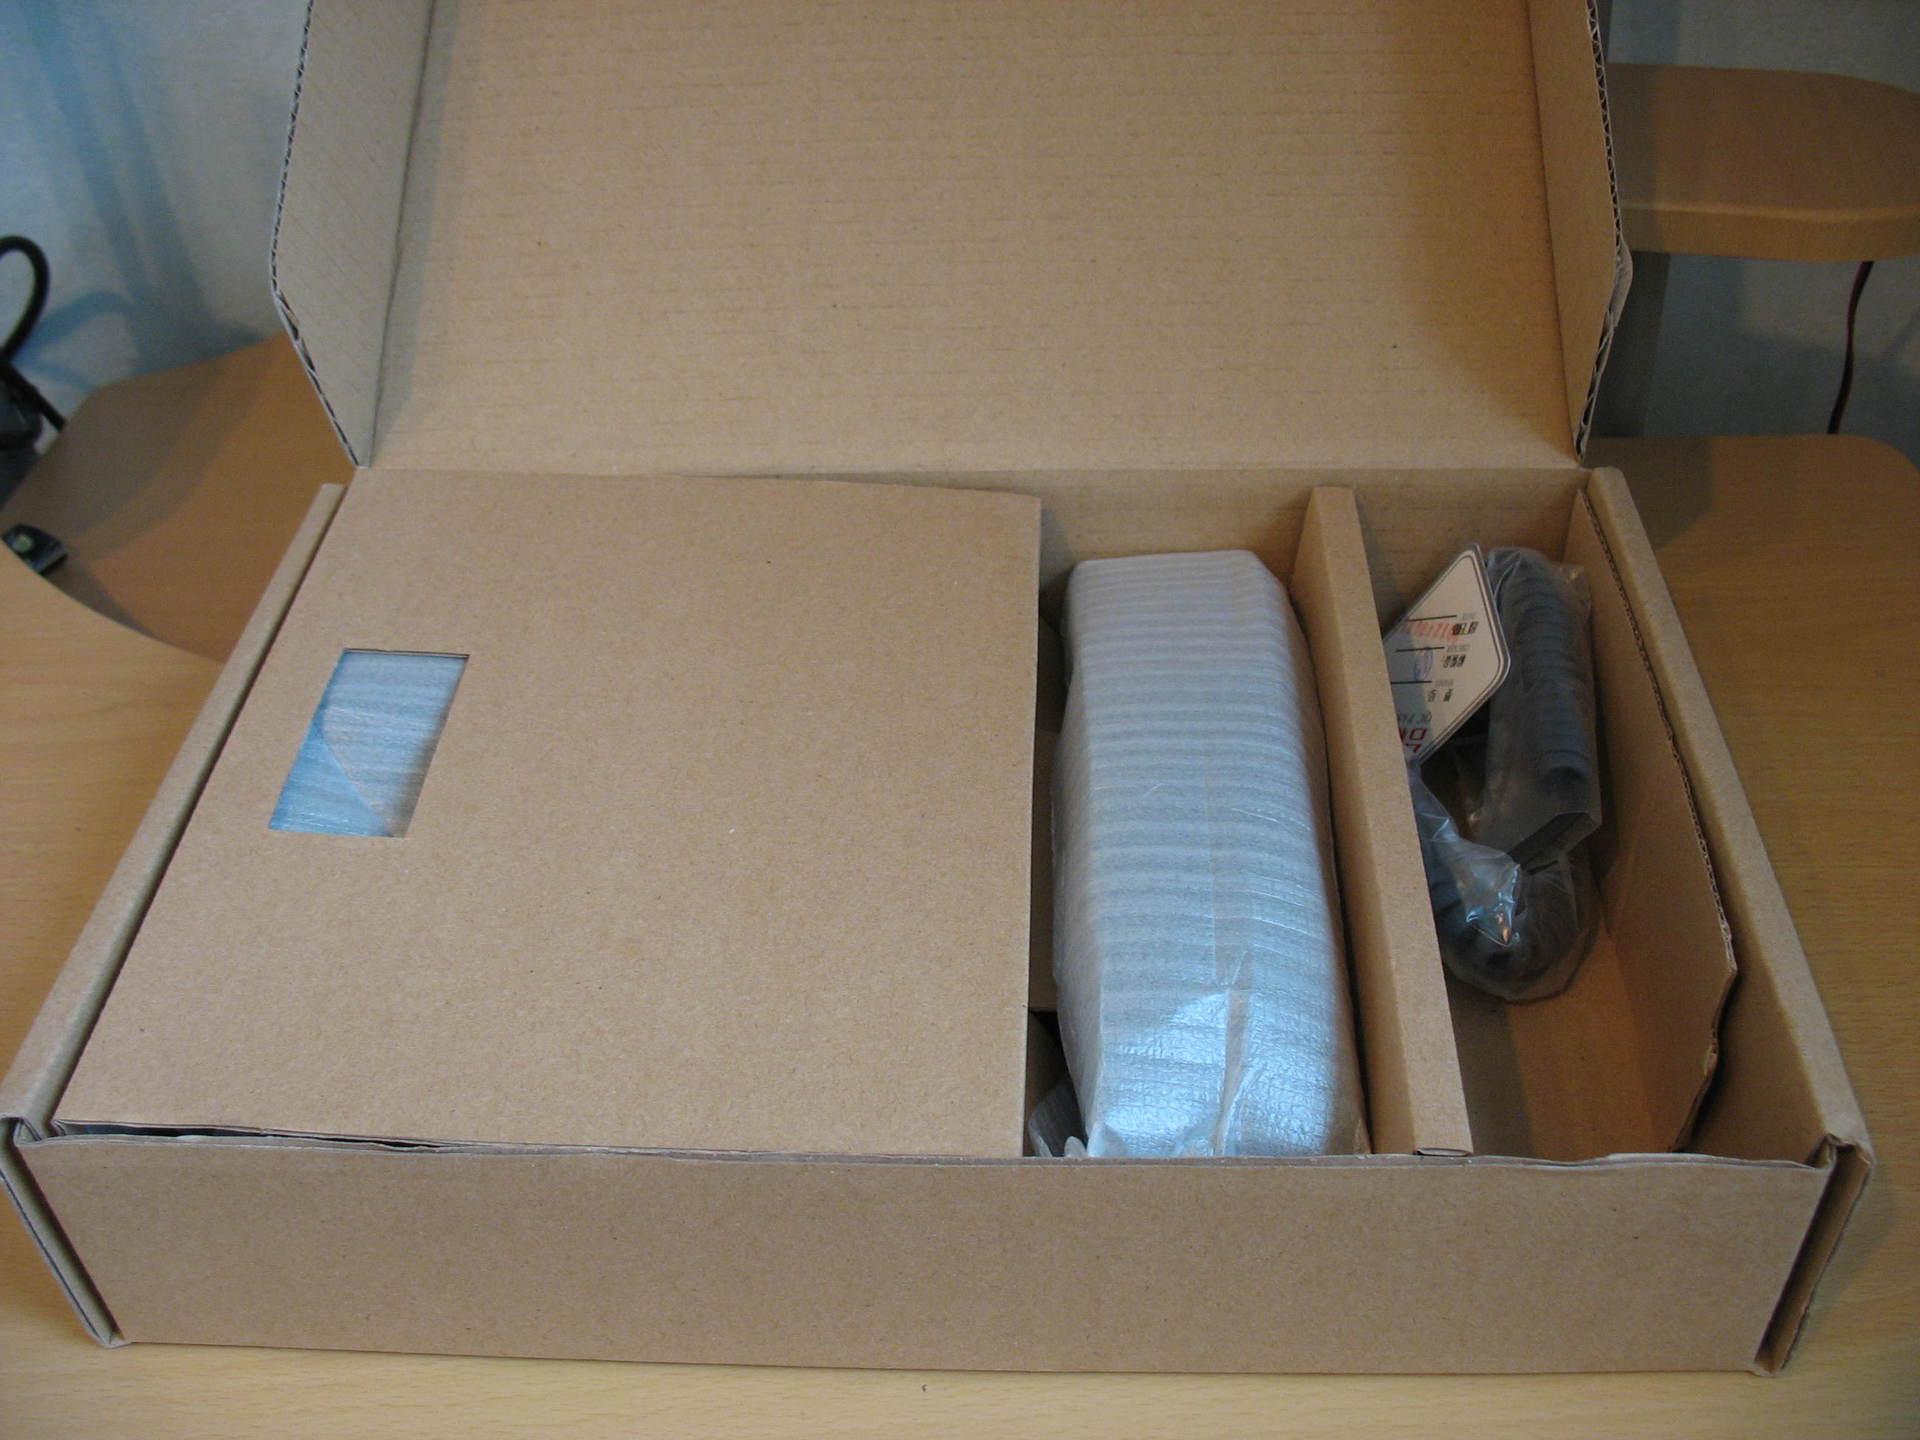 Внутри коробки телефона Escene ES220